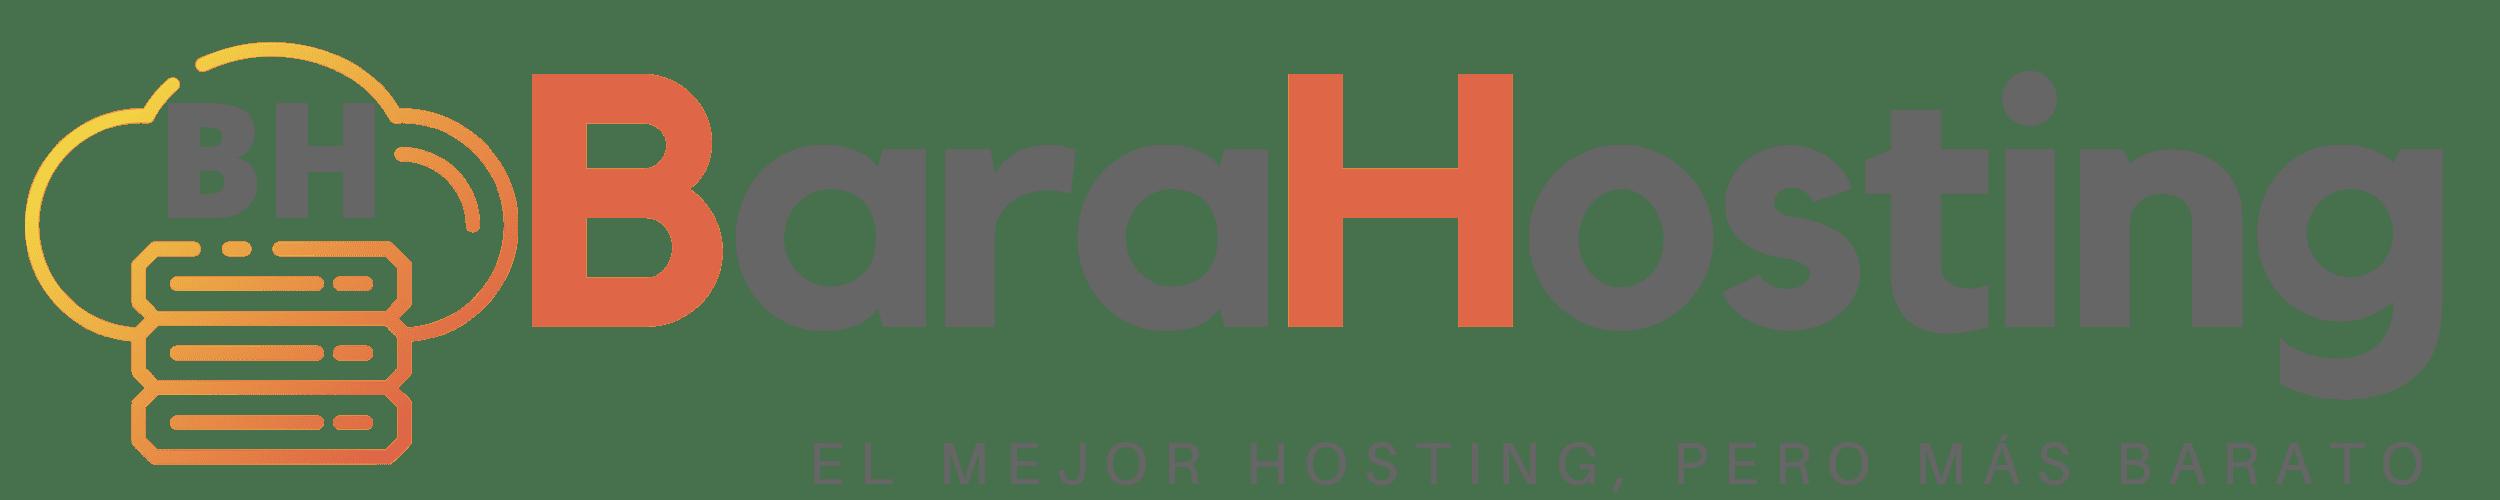 hostingo-sidebar-logo